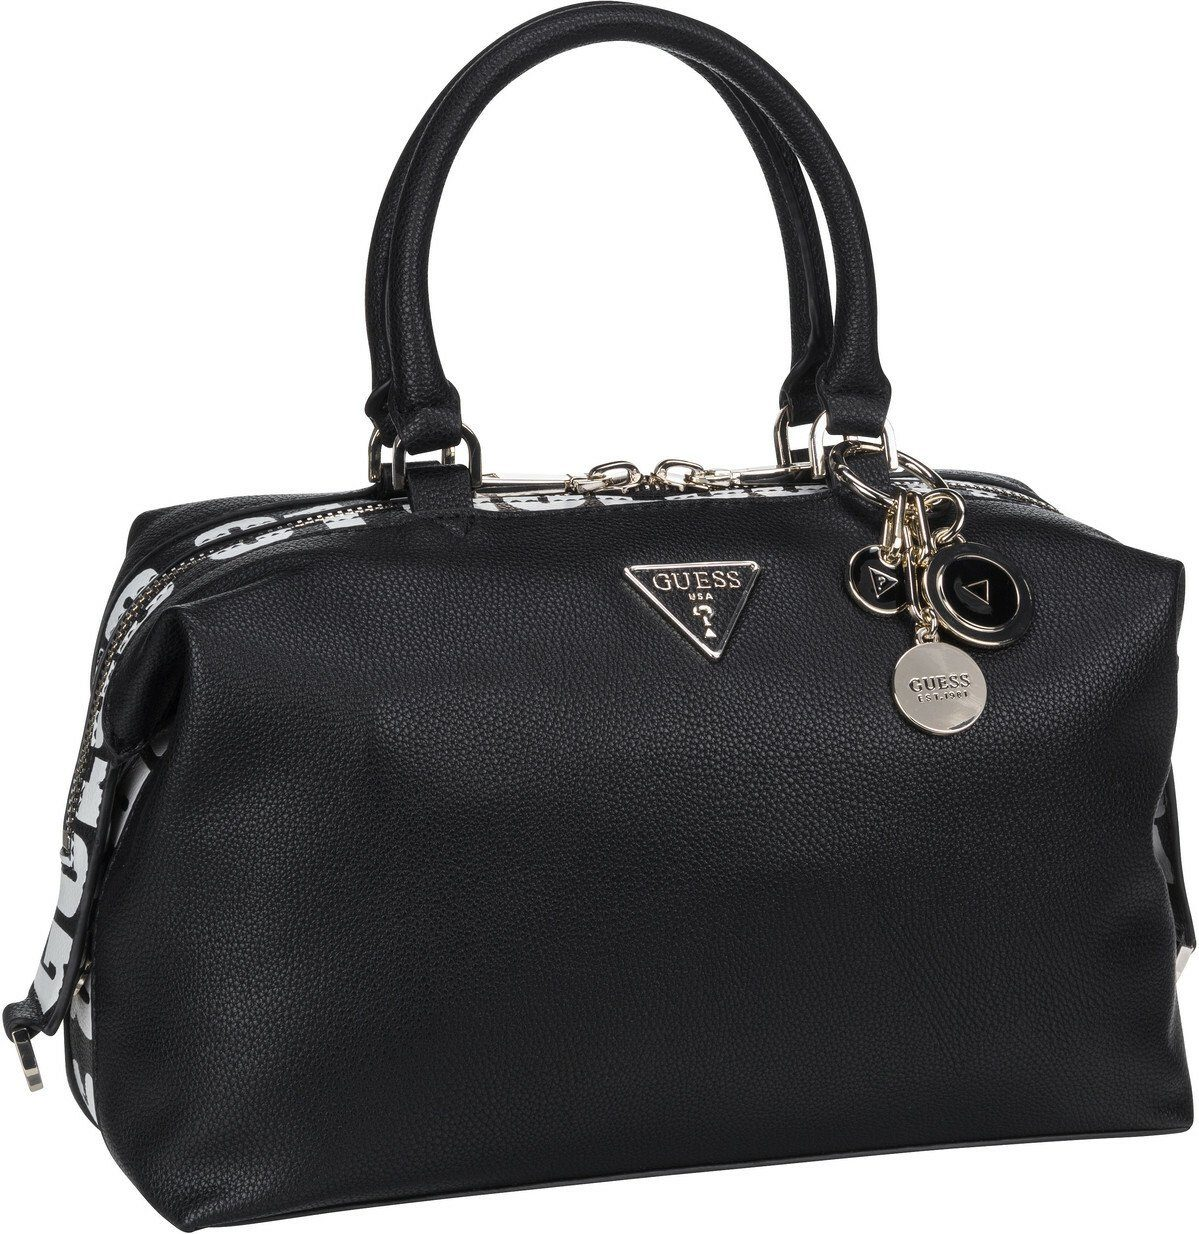 Guess Handtasche »Narita Soho Satchel«, Henkeltasche online kaufen | OTTO